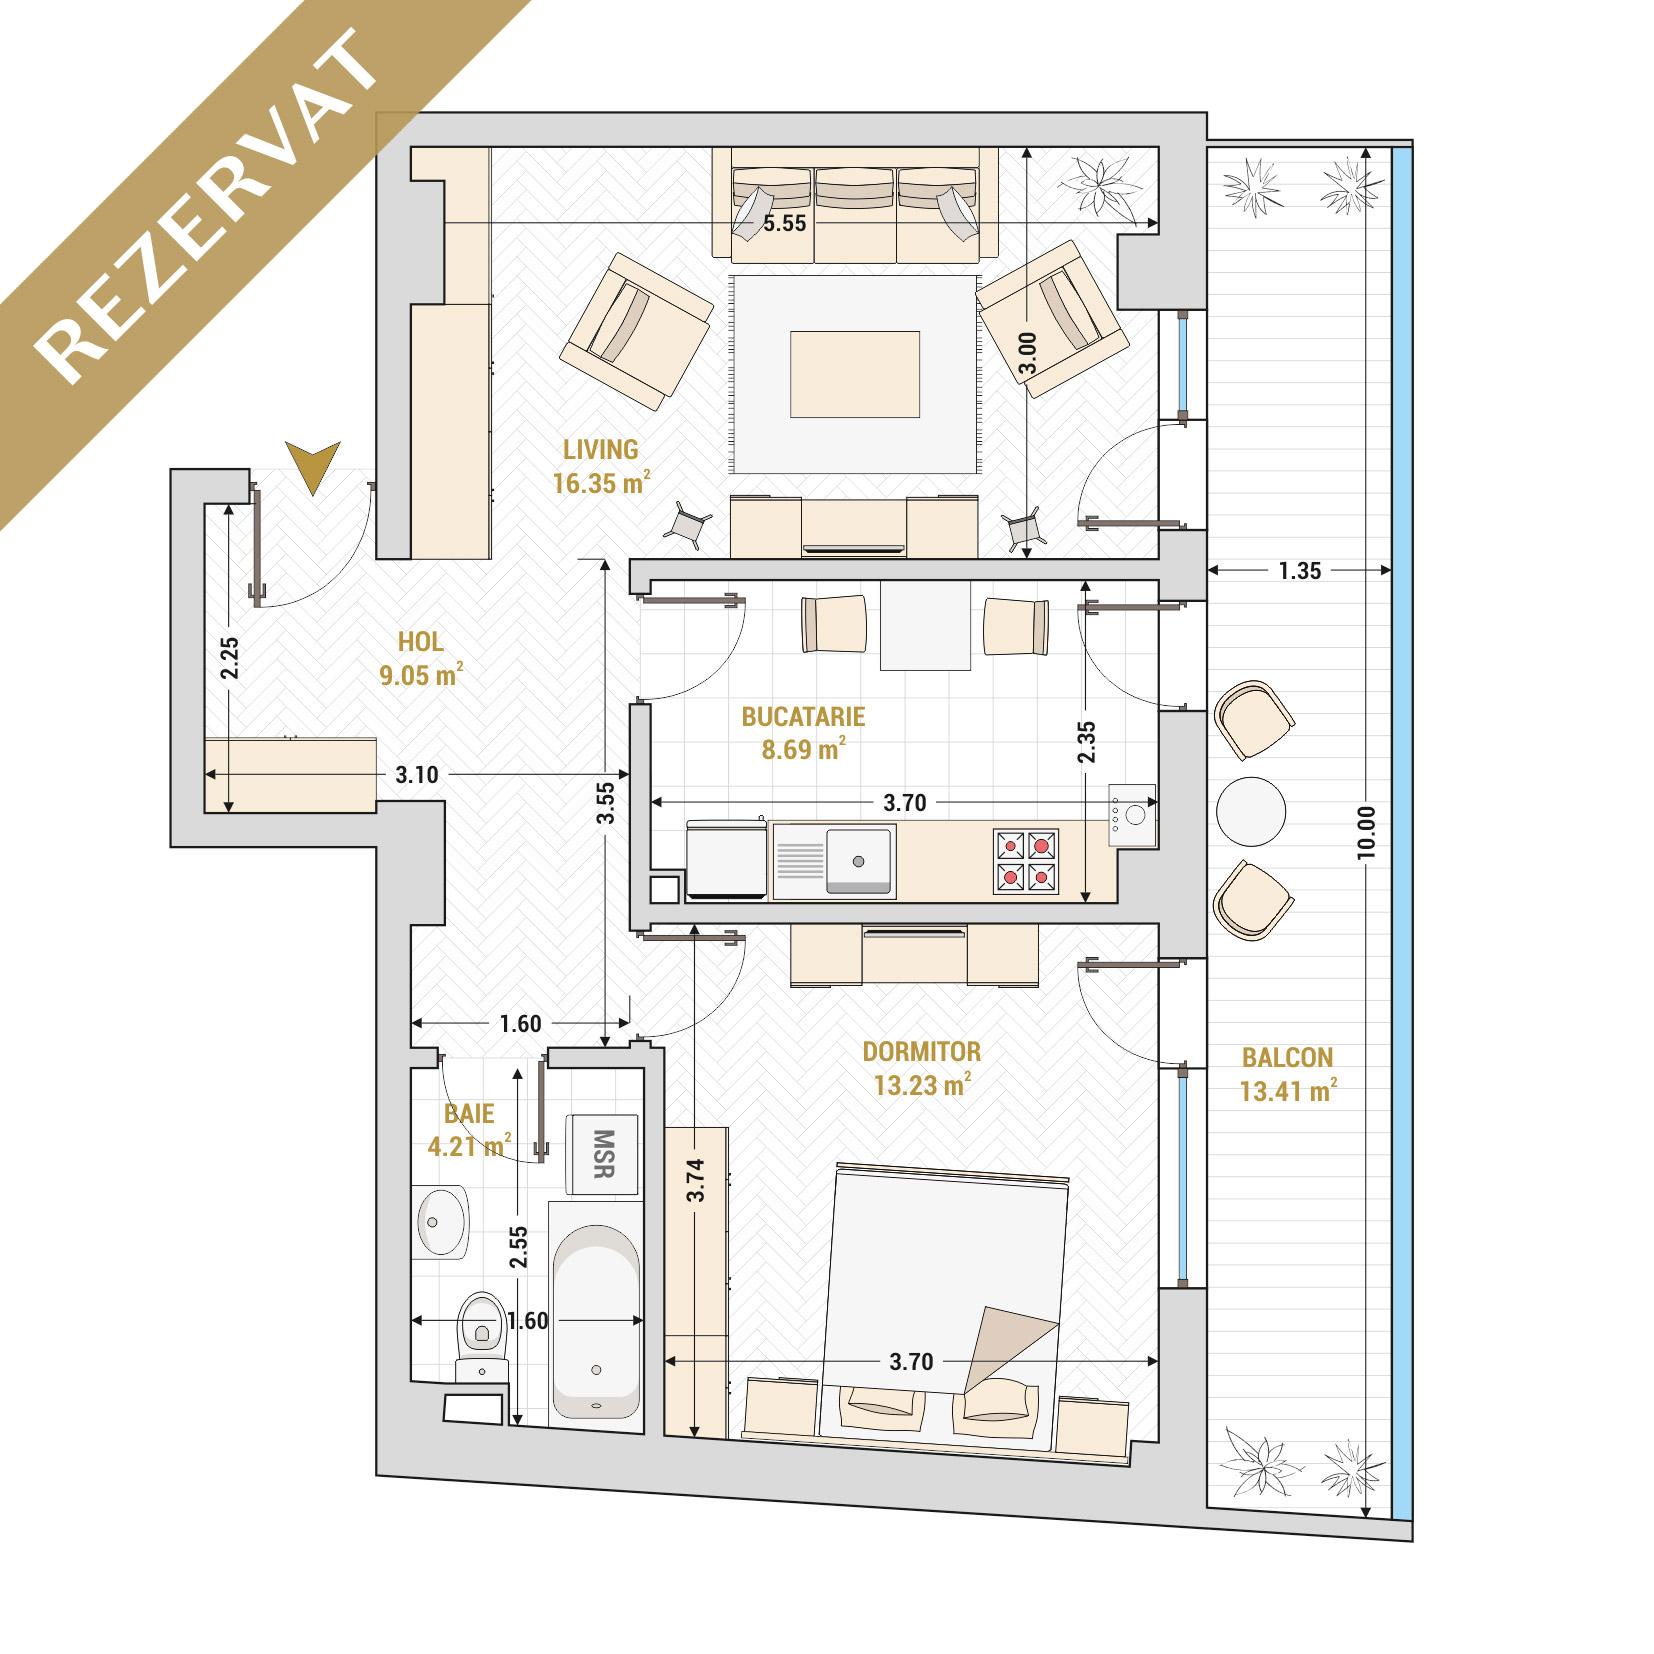 Apartament 2 camere de vanzare Bucuresti - Catedral Residence - Marriott, Piata Unirii, 13 Septembrie, Izvor - Tip 3 - T2A - R